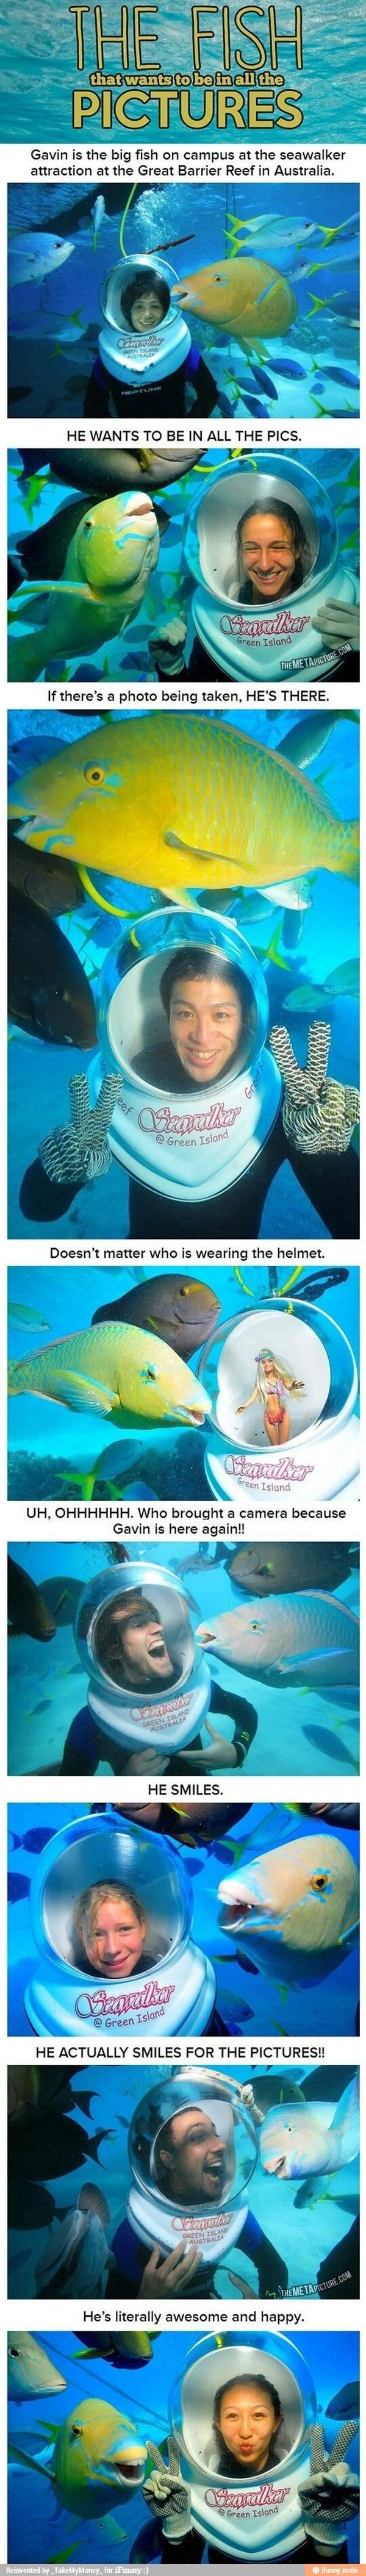 Meet Gavin the Fish!